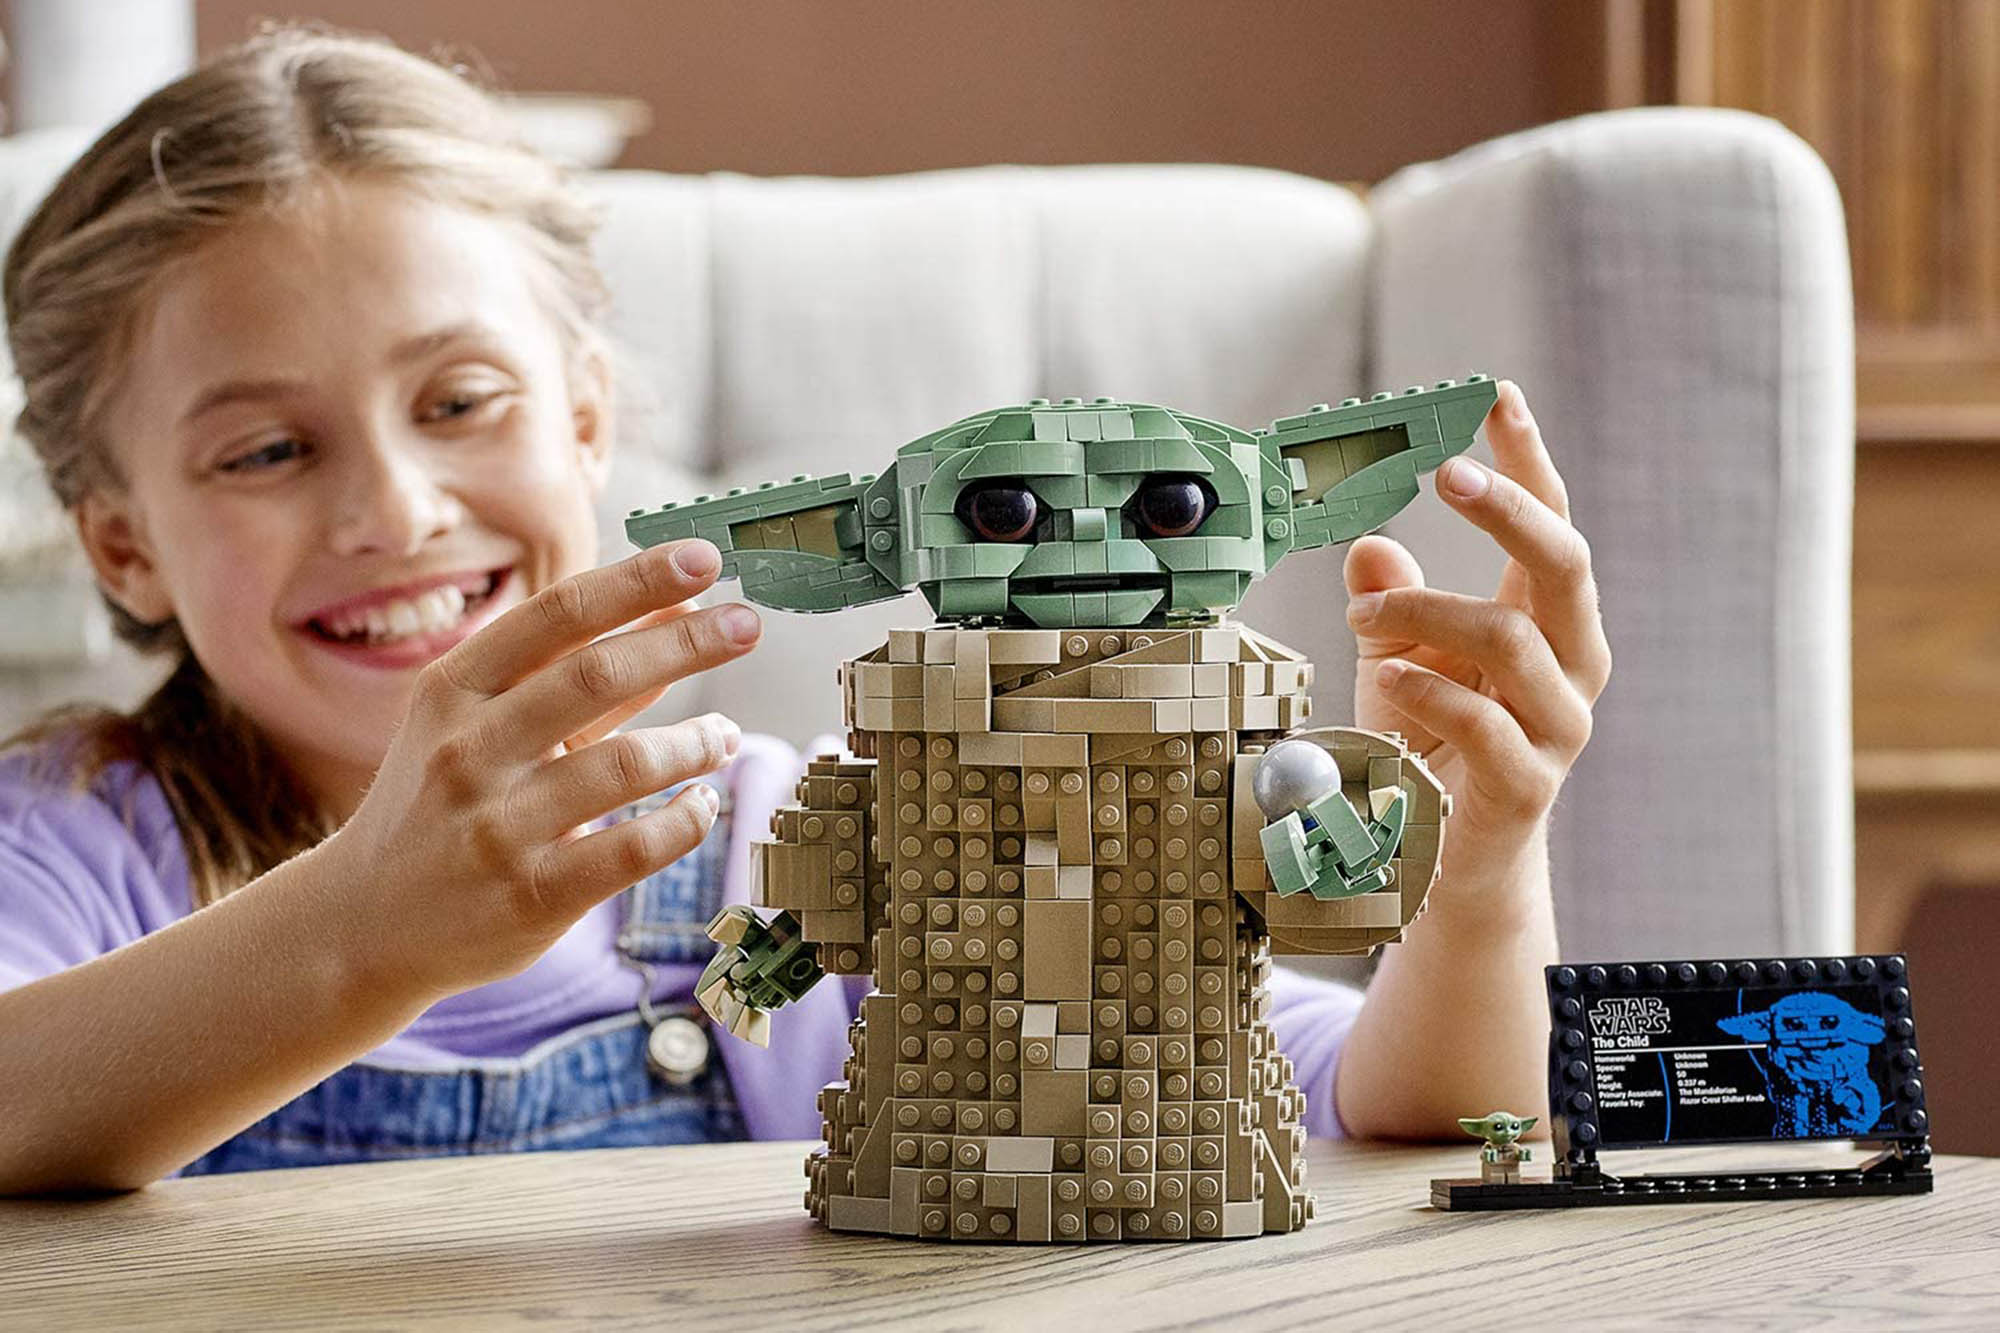 Disney to release Baby Yoda Lego set for 'The Mandalorian'